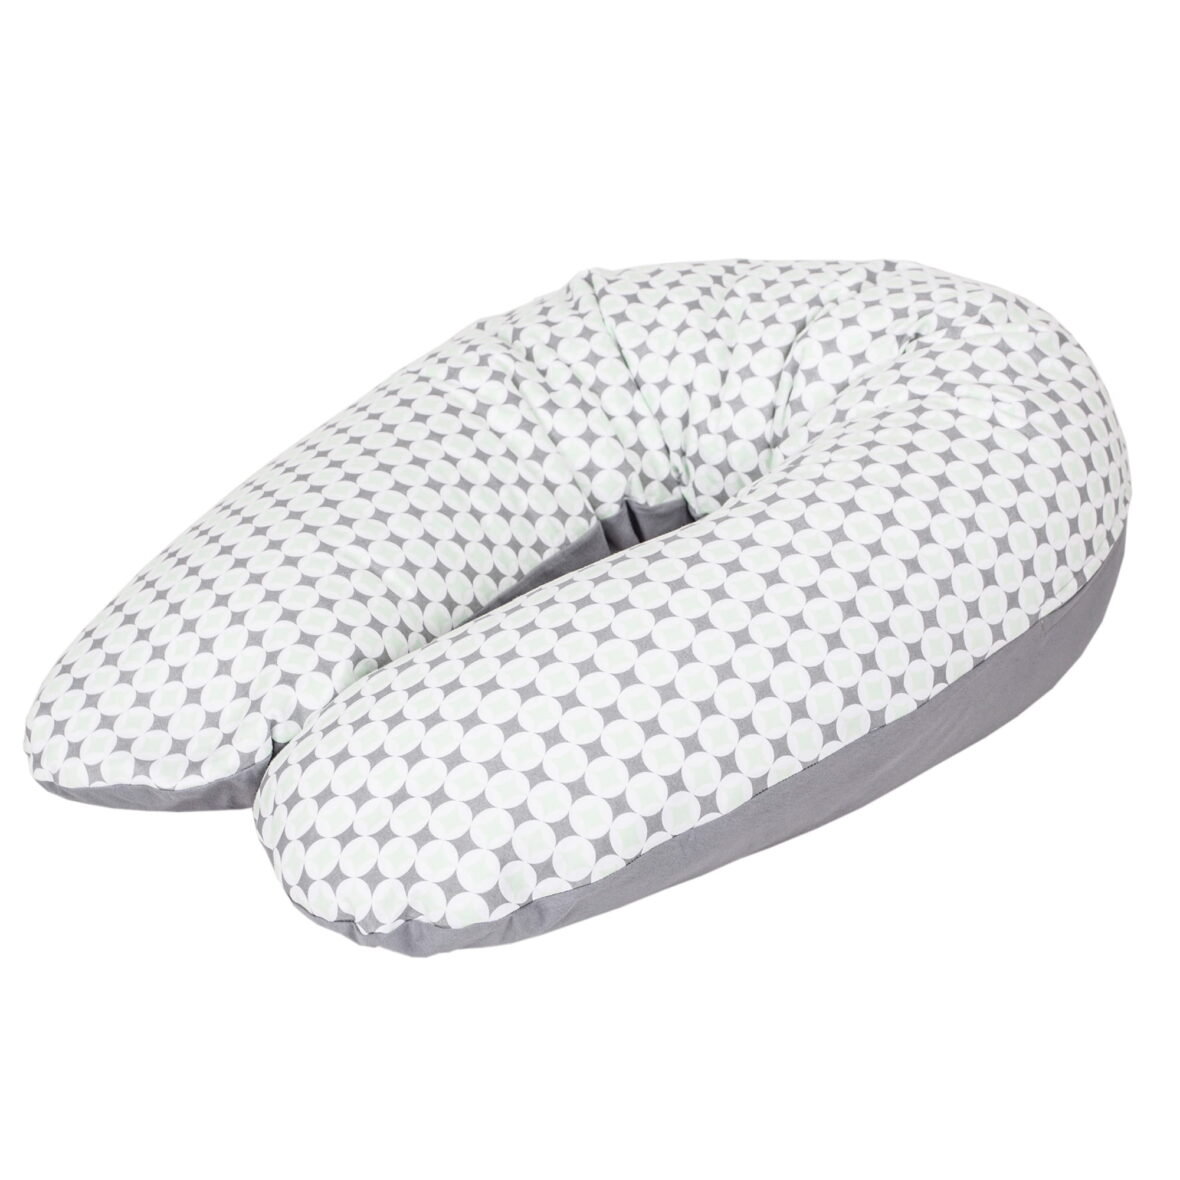 Jastuk za dojenje PHYSIO Multi jersey Diamonds & circles (190×35)